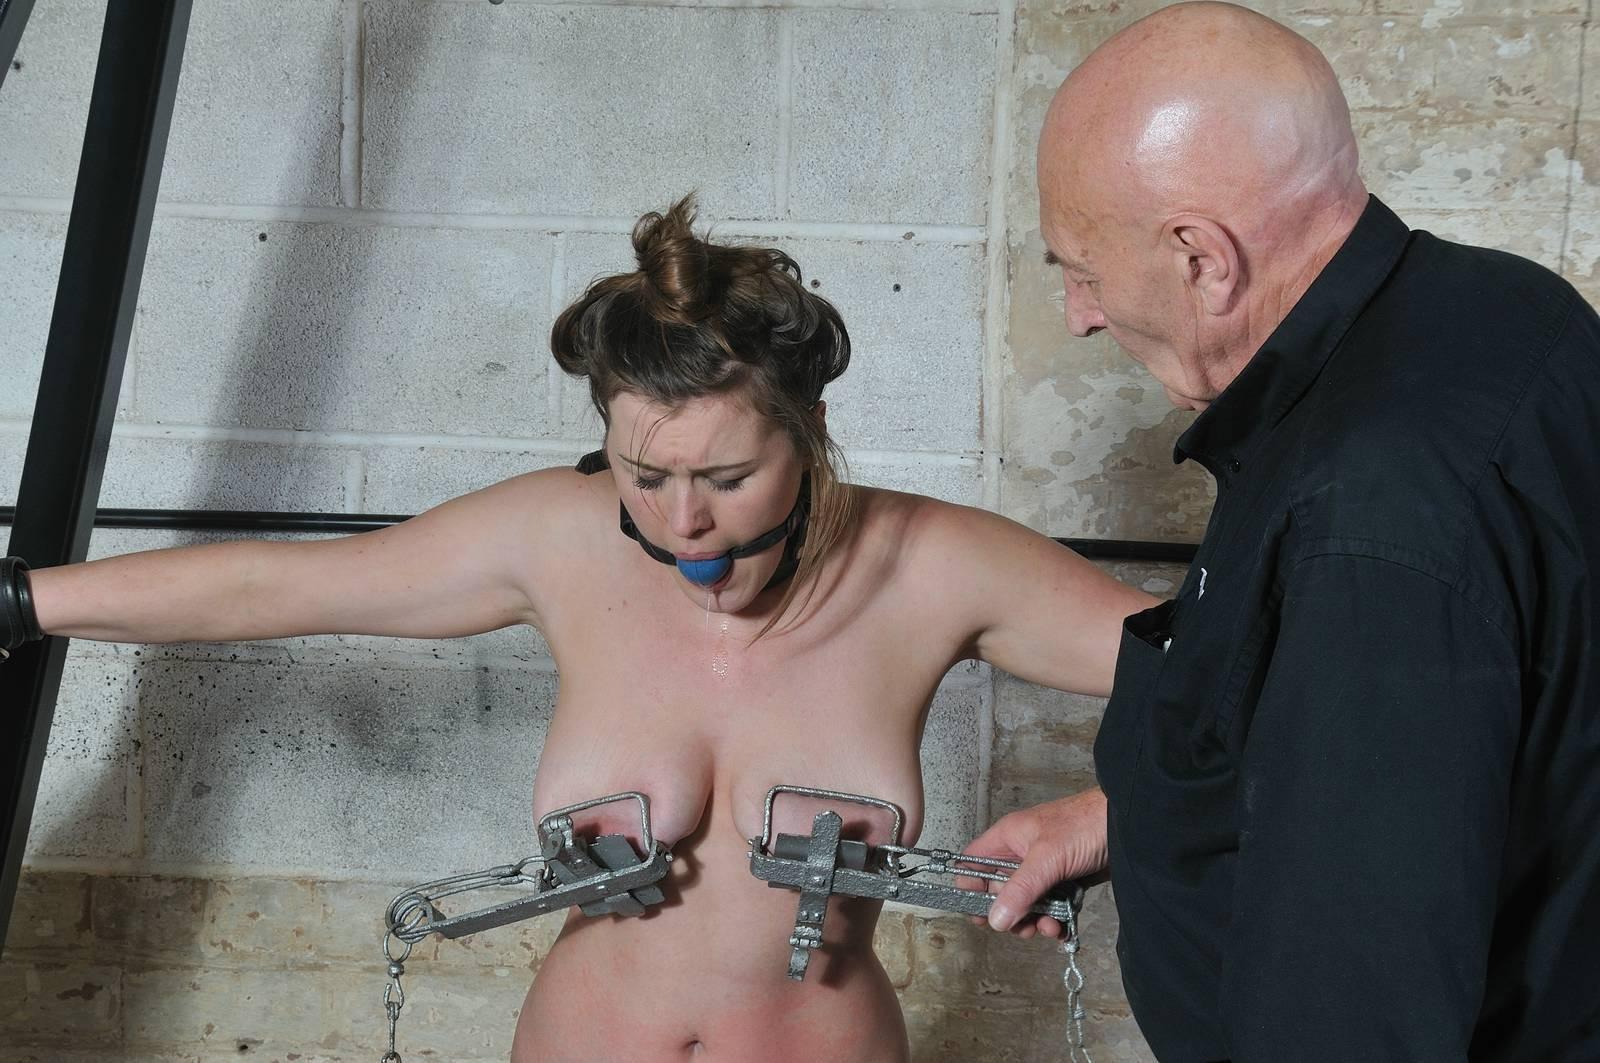 Saggy tit torture curious